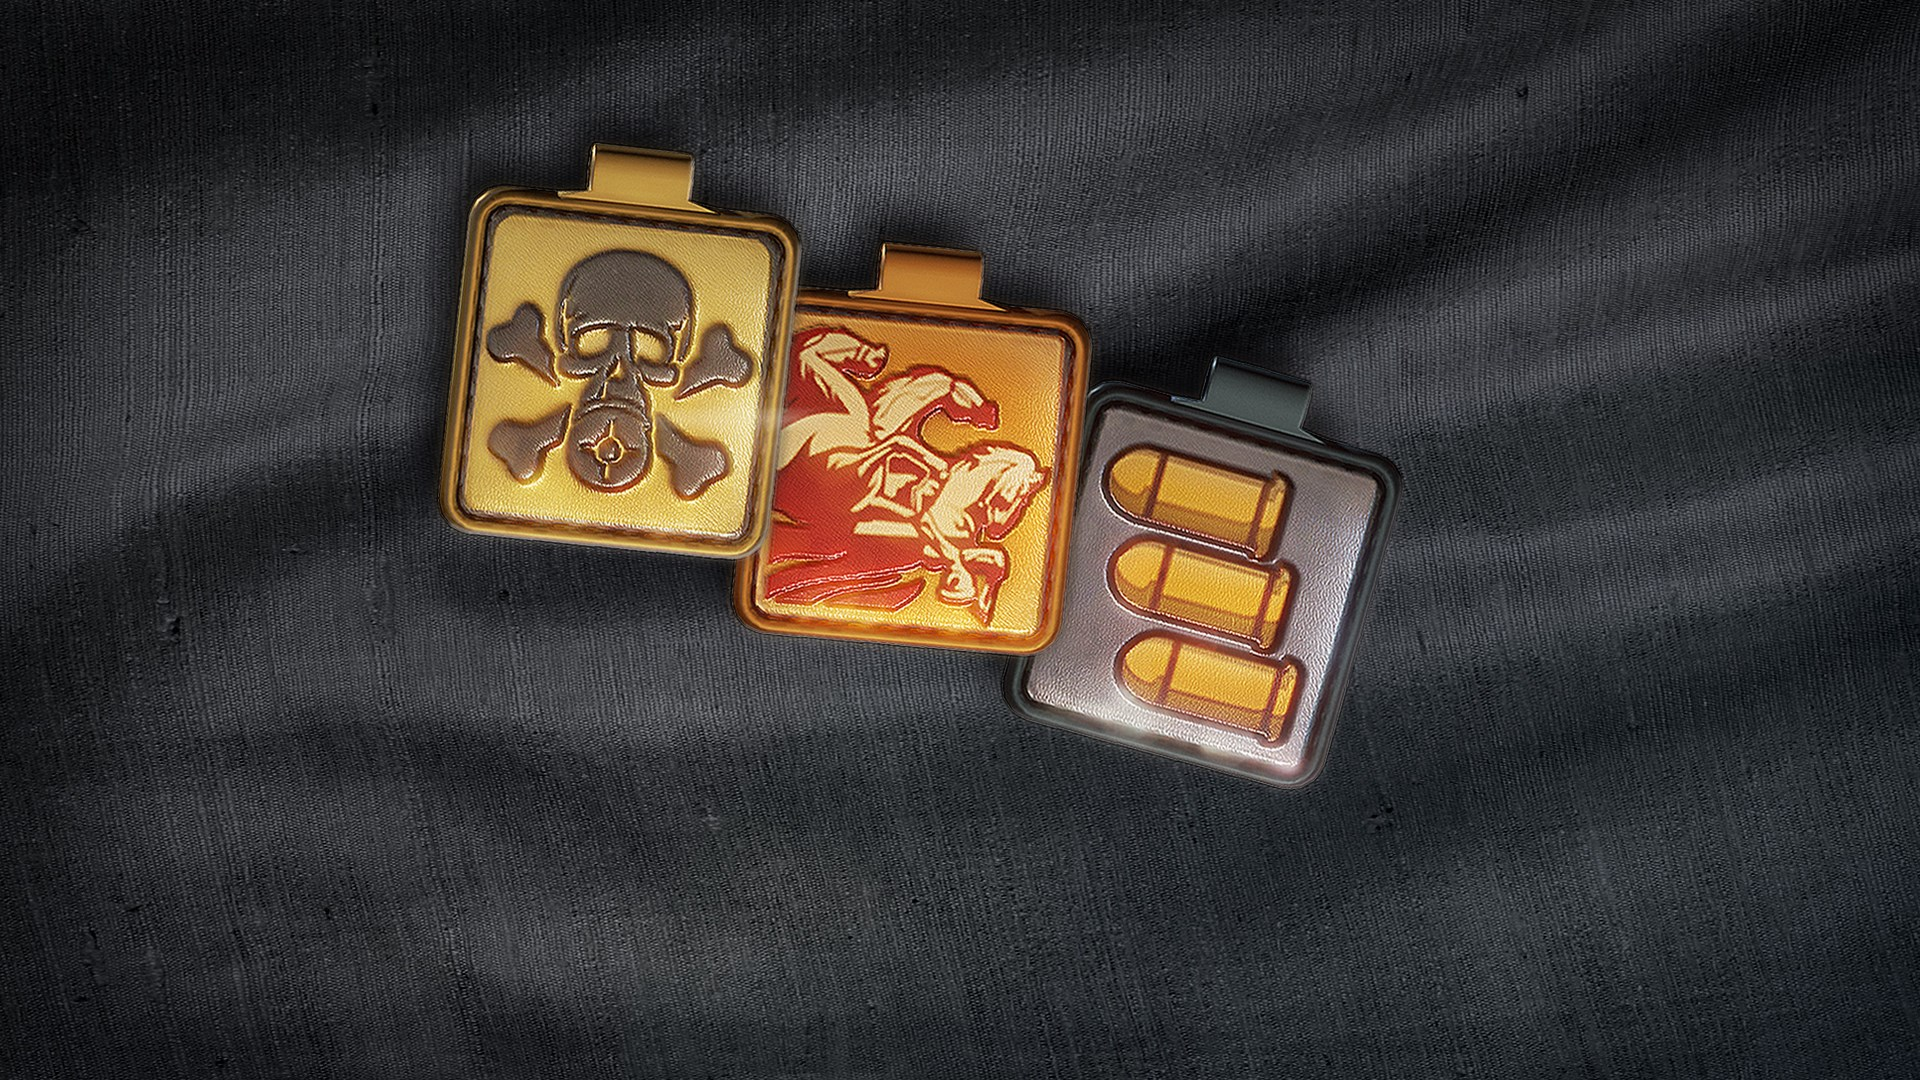 Buy Tom Clancy's Rainbow Six Siege: Operators Icon Charm